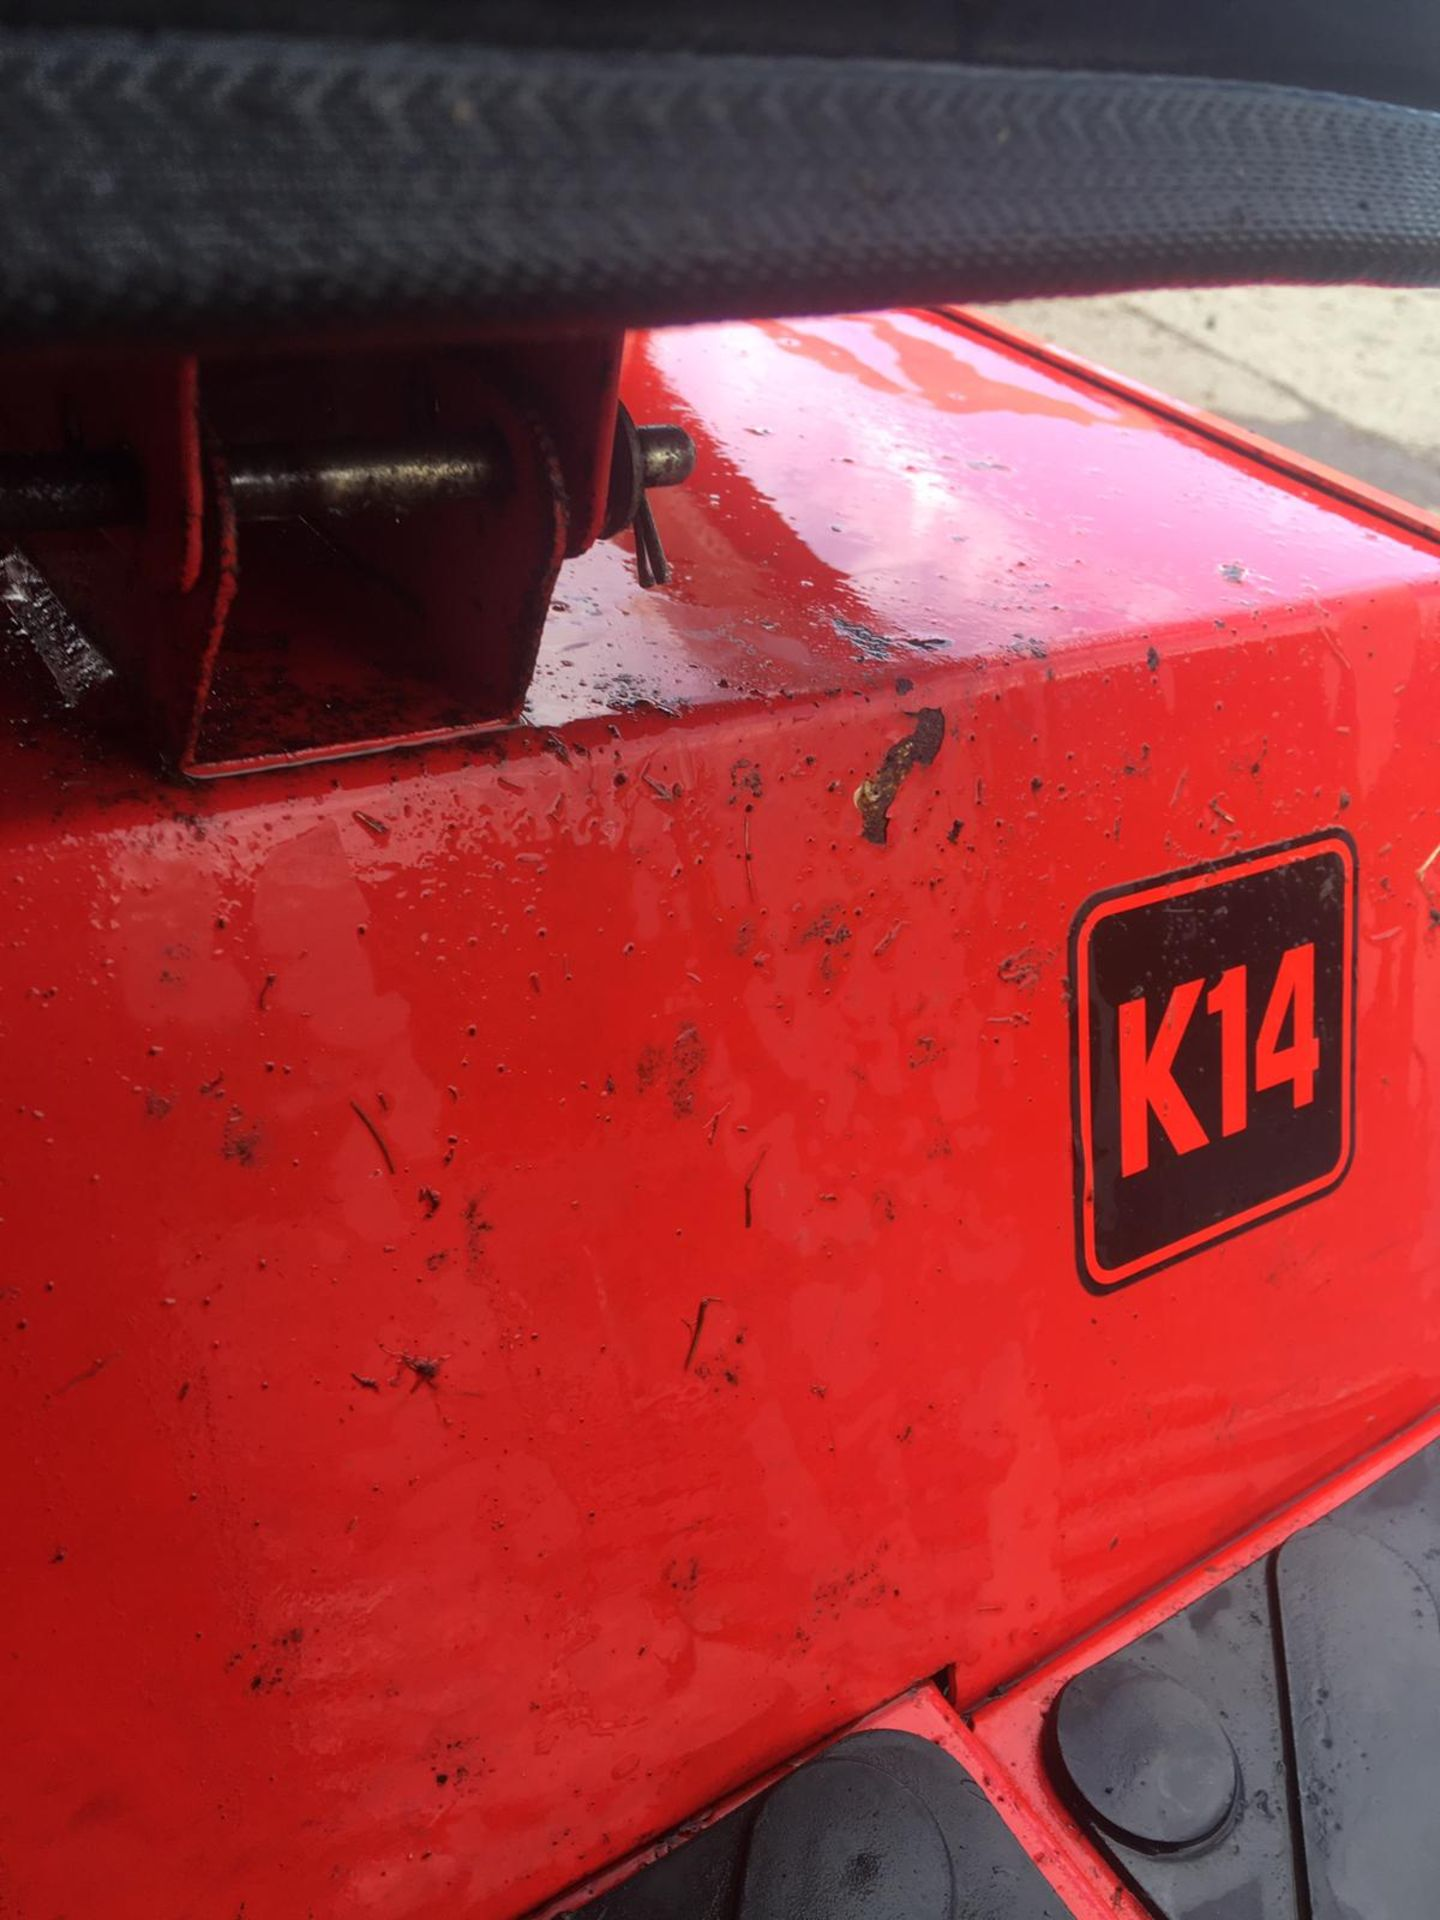 Lot 46 - COUNTAX K14 RIDE ON LAWN MOWER, VANGUARD 14HP ENGINE, STARTS, RUNS AND DRIVES *NO VAT*